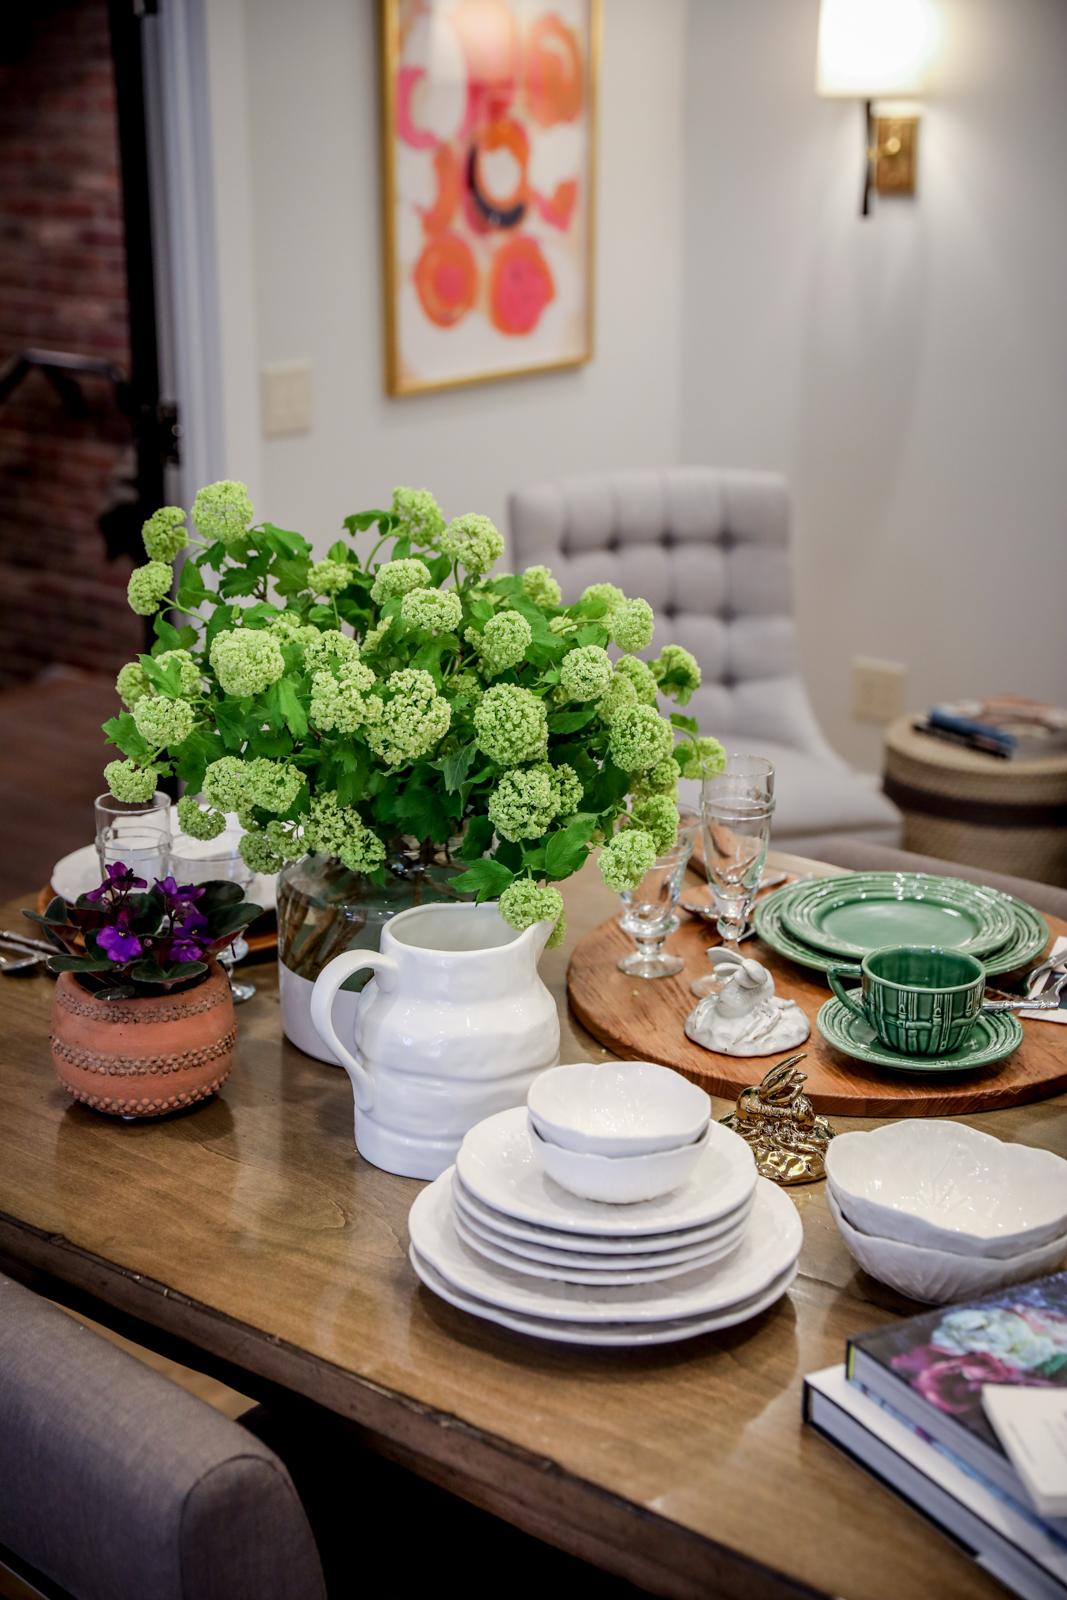 Tablescape-Modern-Spring-Bamboo-Green-Charcuterie-Terracotta-Gold.jpg